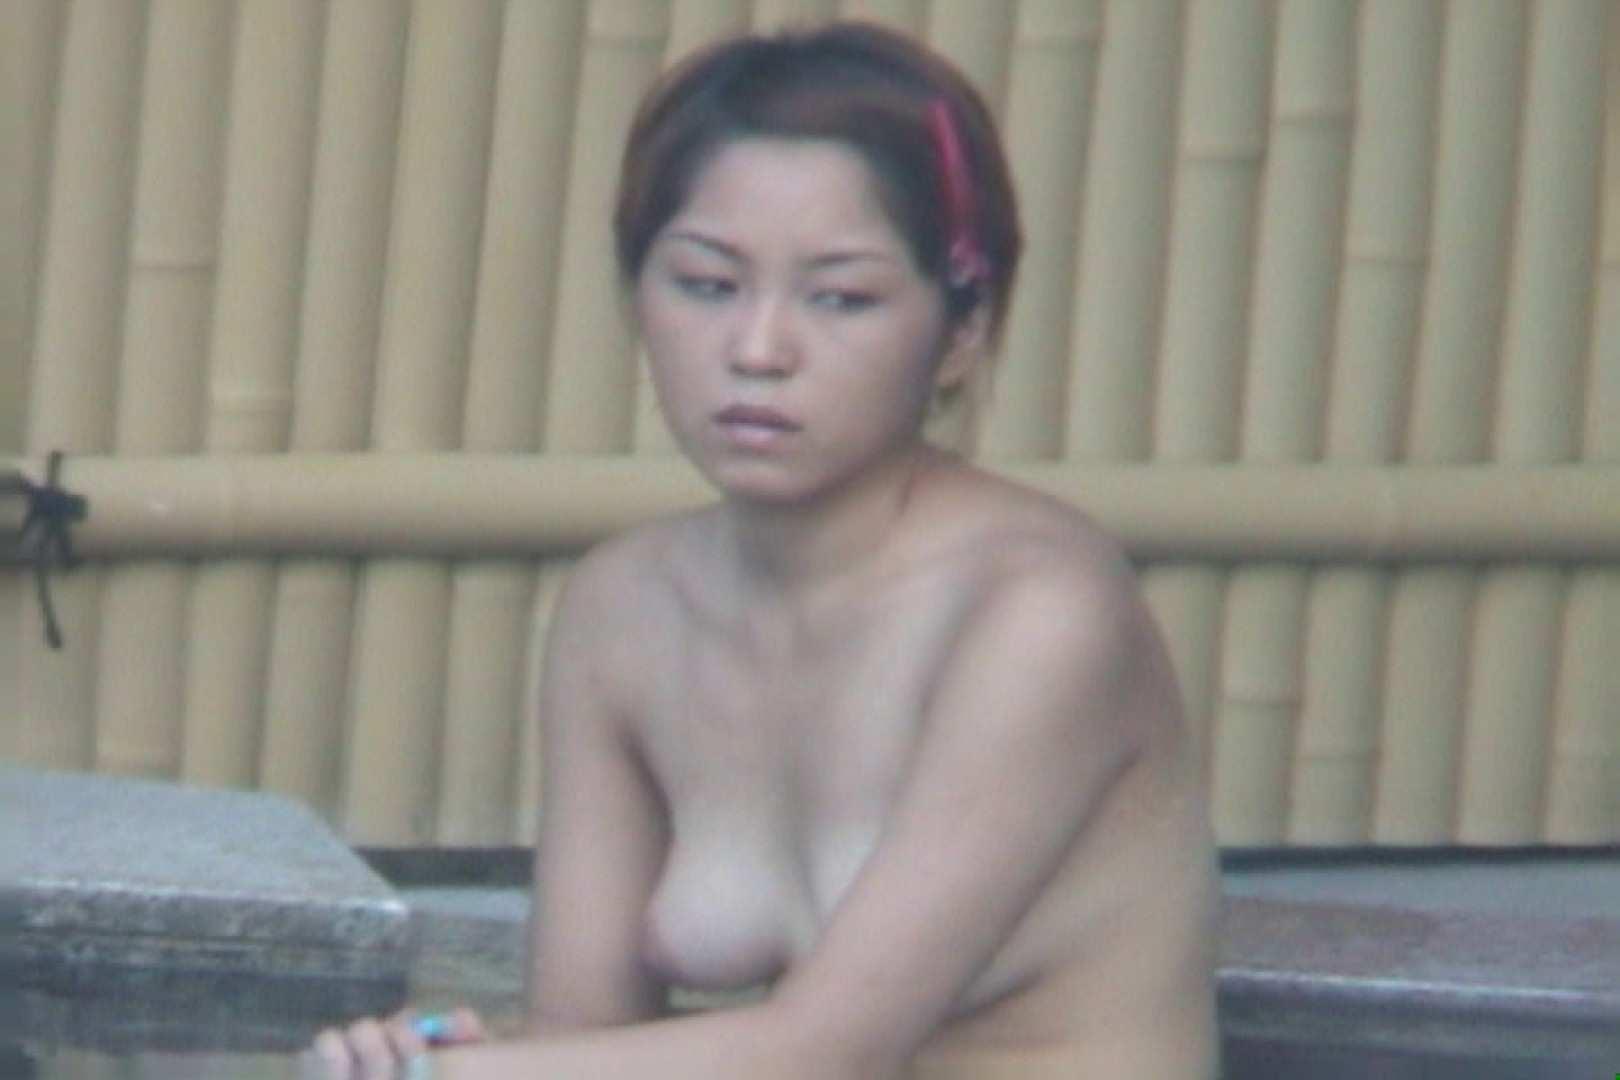 Aquaな露天風呂Vol.574 綺麗なOLたち オマンコ無修正動画無料 88枚 68